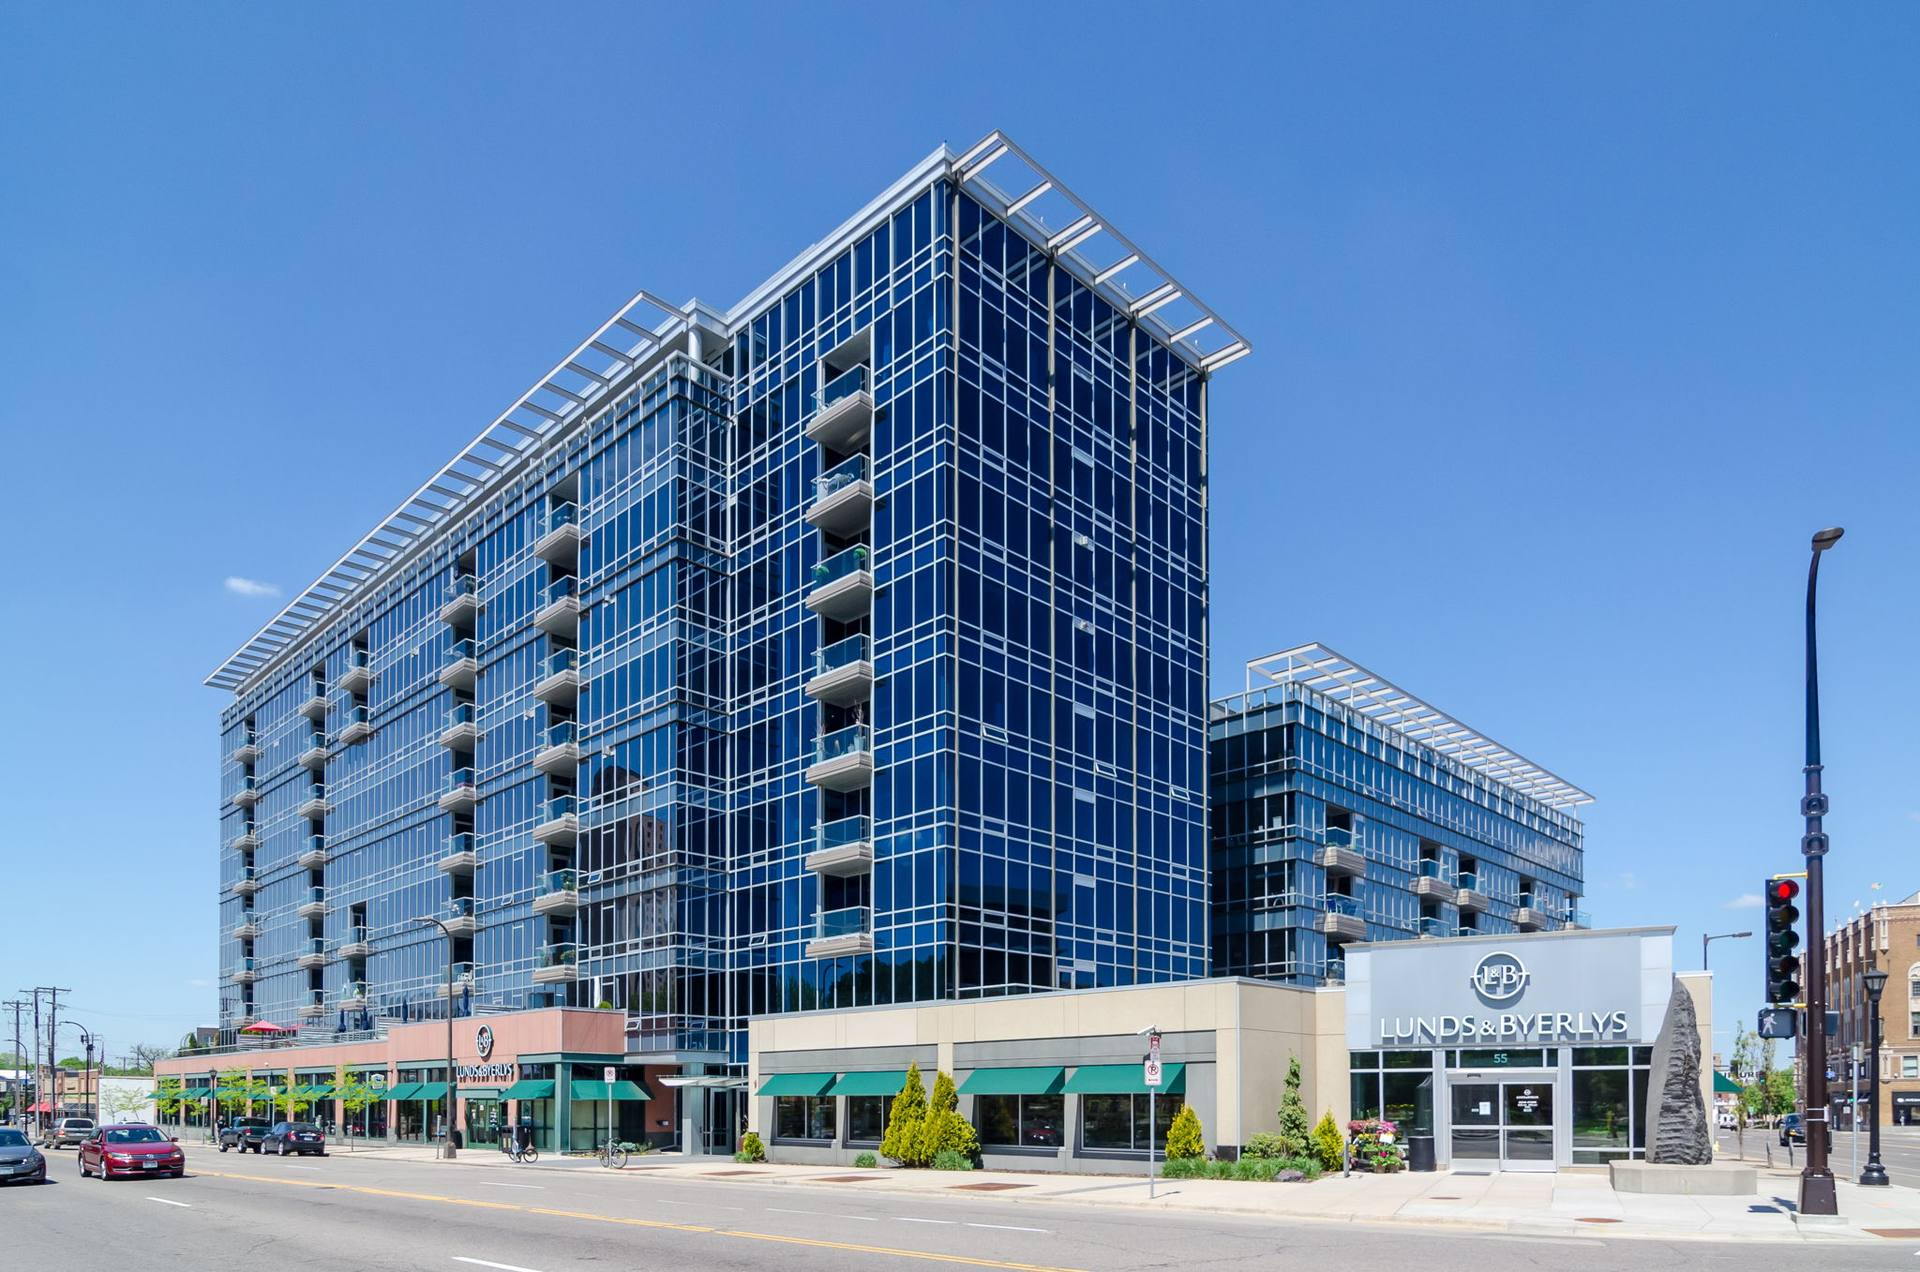 45 University Ave SE #206, Minneapolis, MN 55414, US